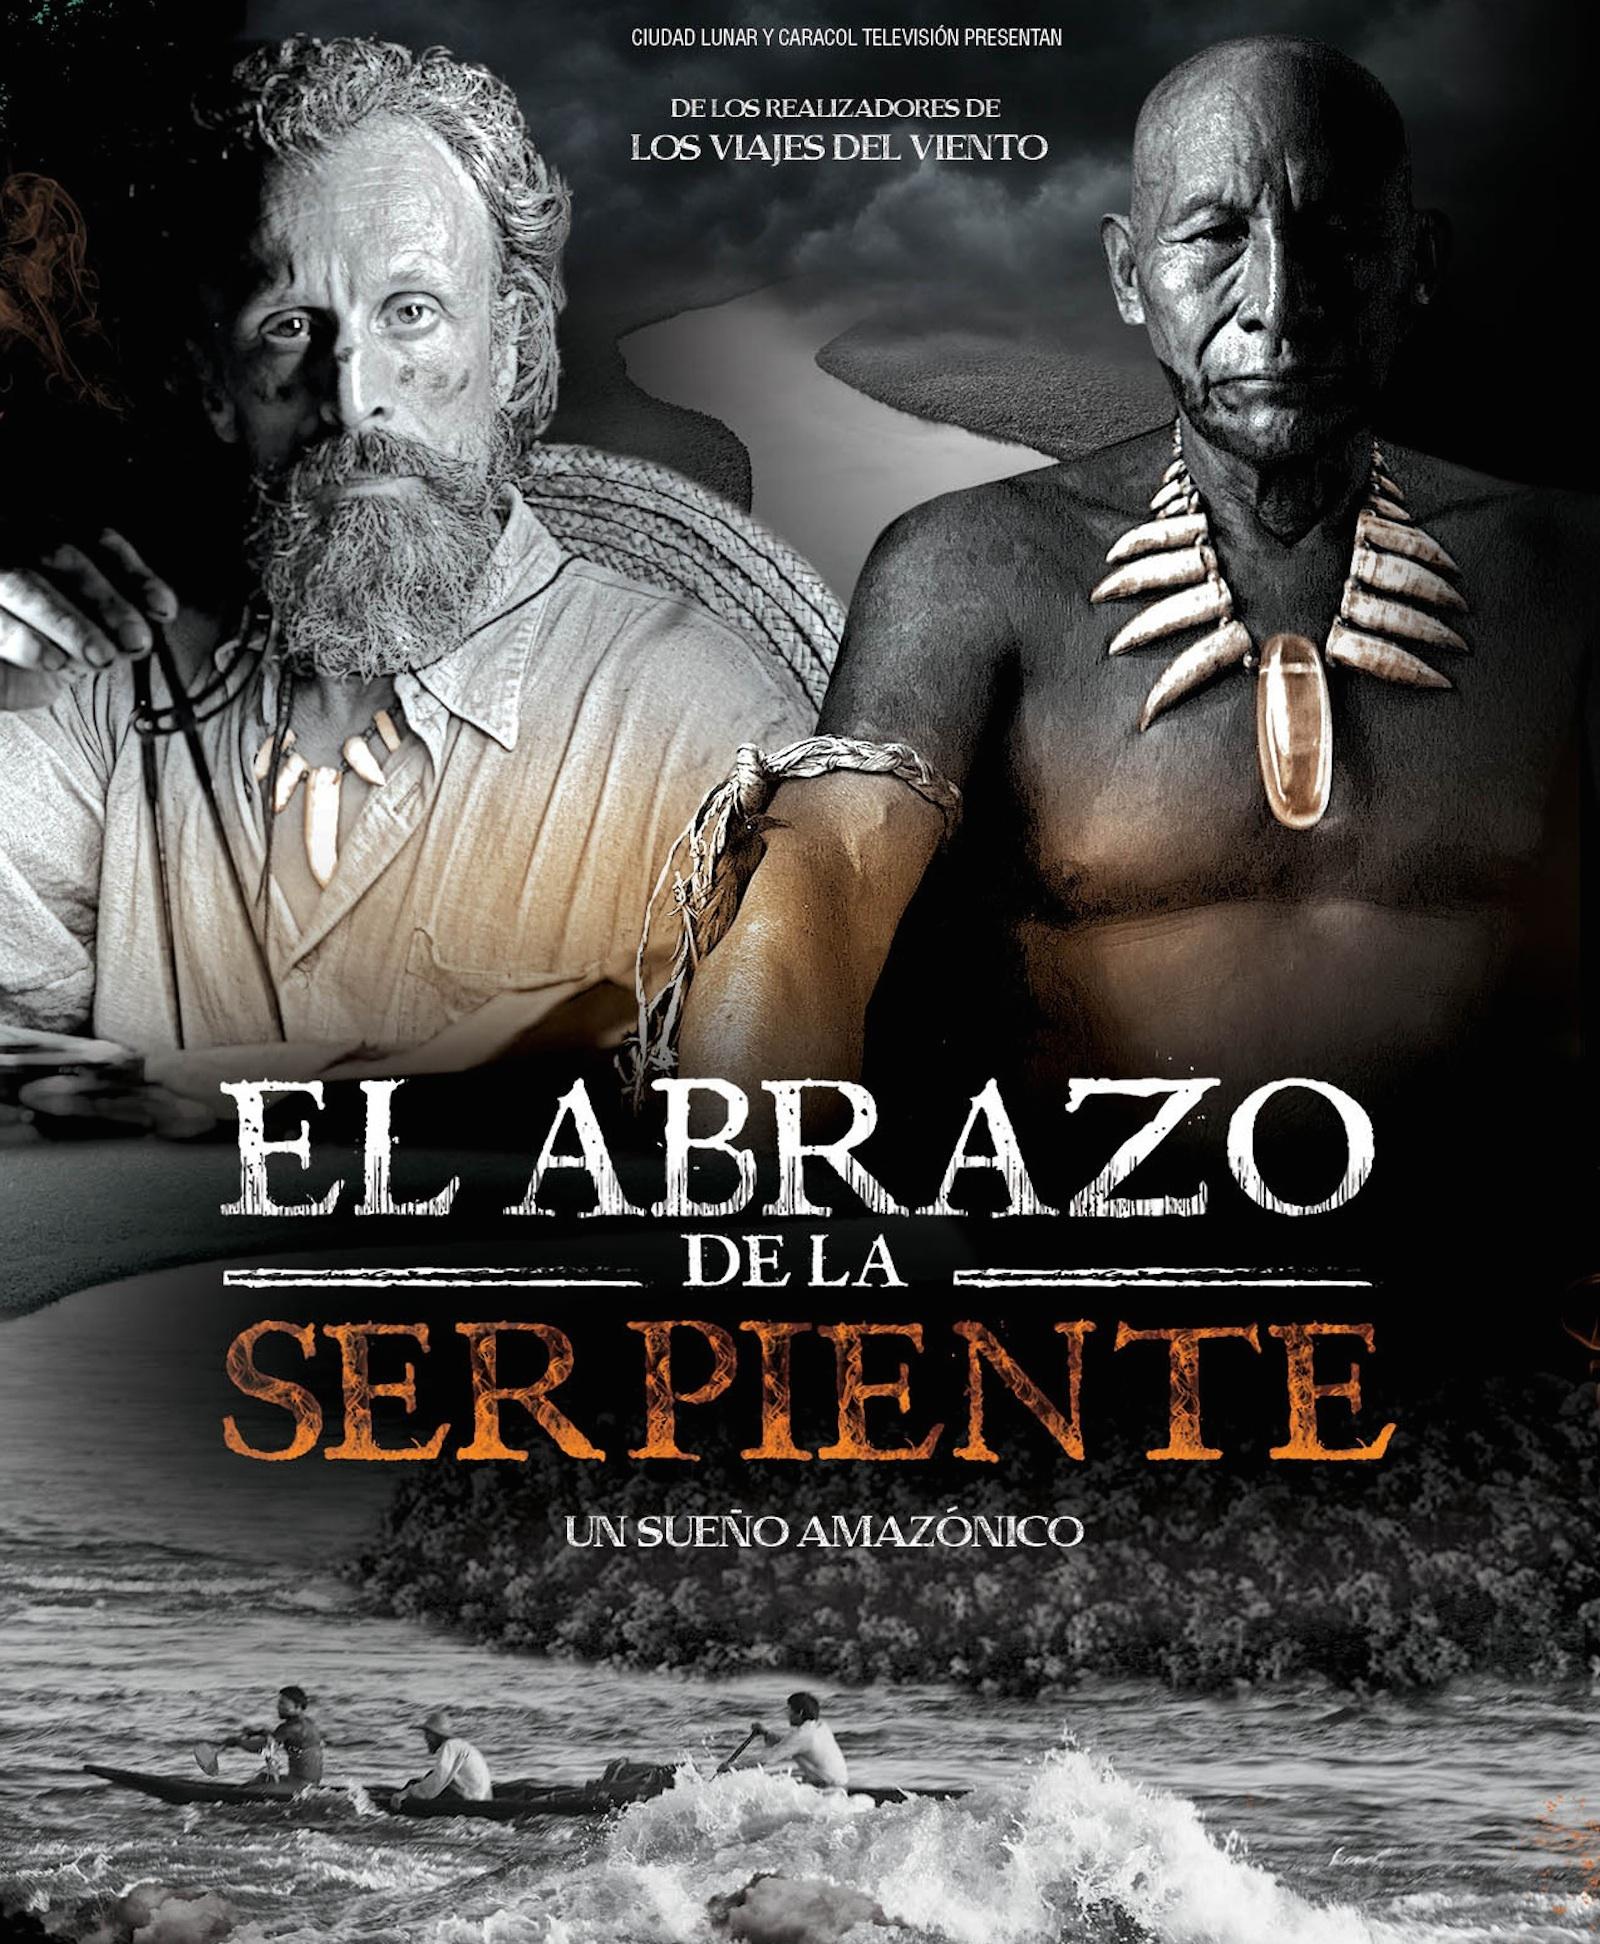 Abrazo-serpiente9.jpg